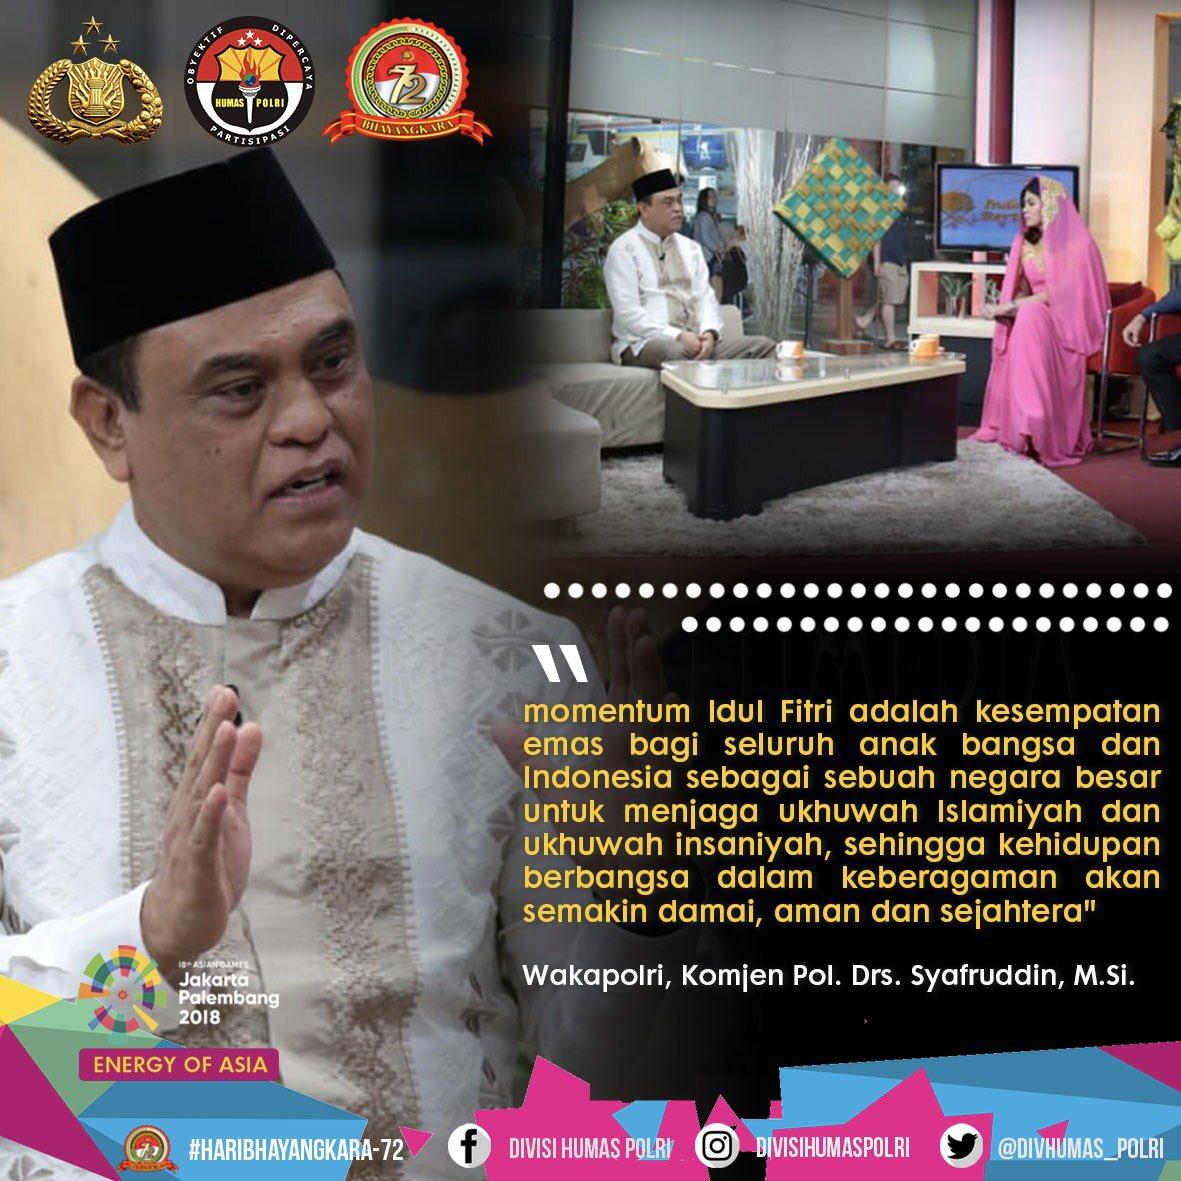 "Divisi Humas Polri в Twitter: ""Momentum Idul Fitri adalah kesempatan emas  bagi seluruh anak bangsa dan Indonesia sebagai sebuah negara besar untuk  menjaga ukhuwah islamiyah dan ukhuwah insaniyah, sehingga kehidupan  berbangsa dalam"